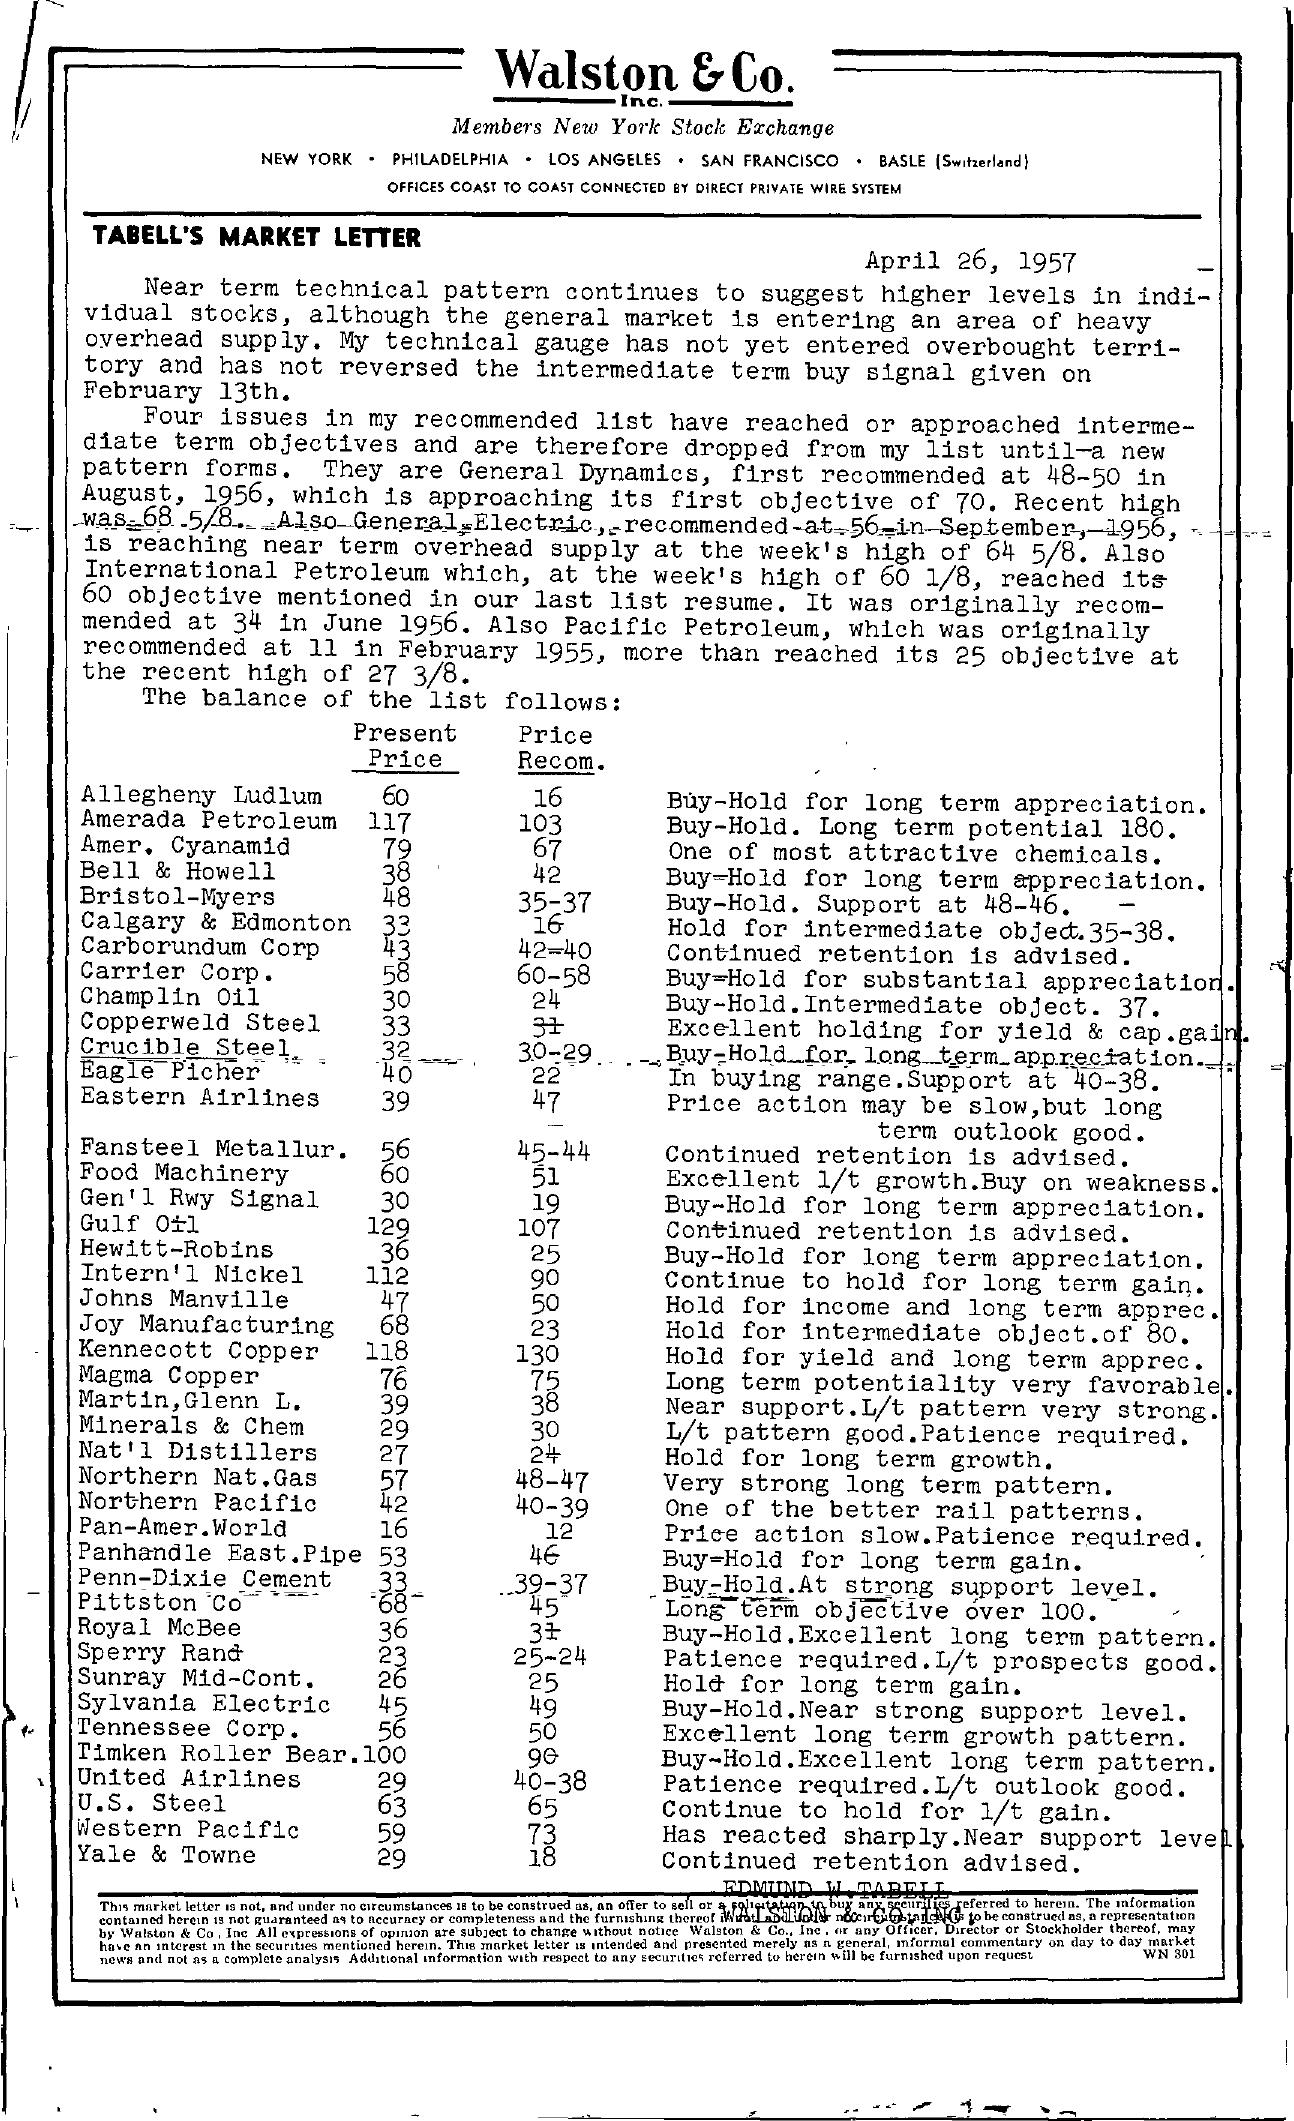 Tabell's Market Letter - April 26, 1957